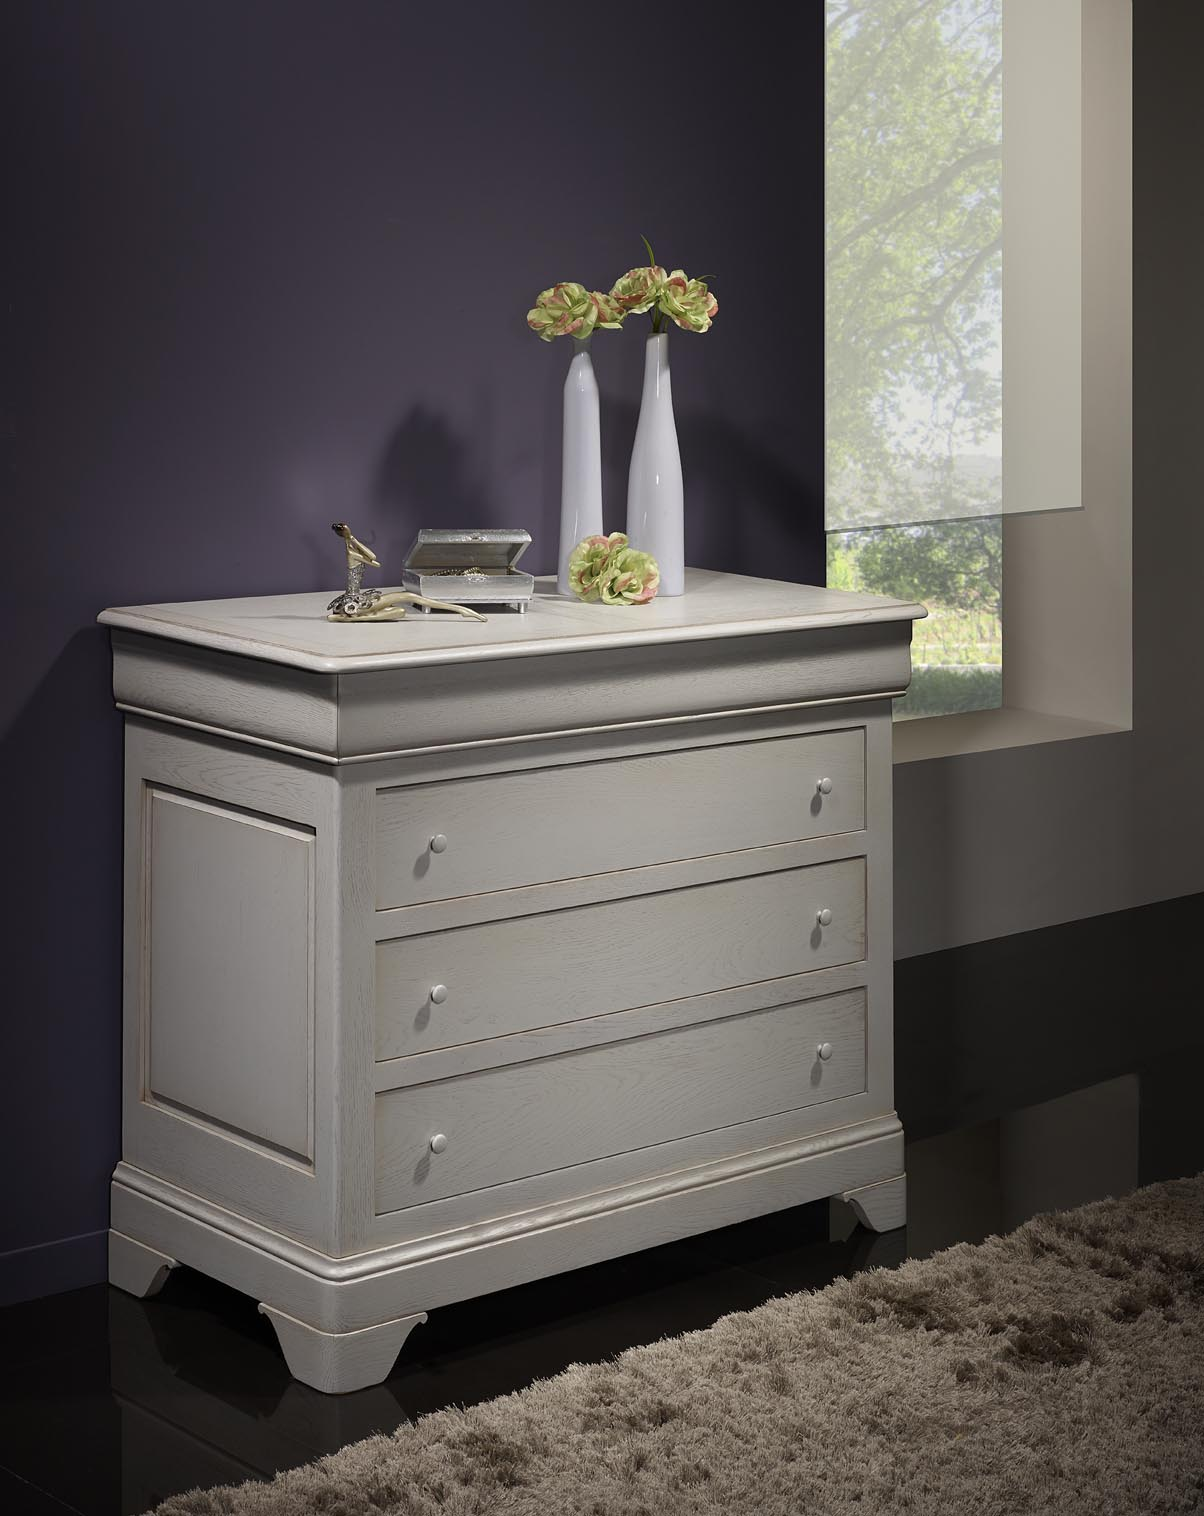 commode 4 tiroirs en ch ne massif de style louis philippe. Black Bedroom Furniture Sets. Home Design Ideas